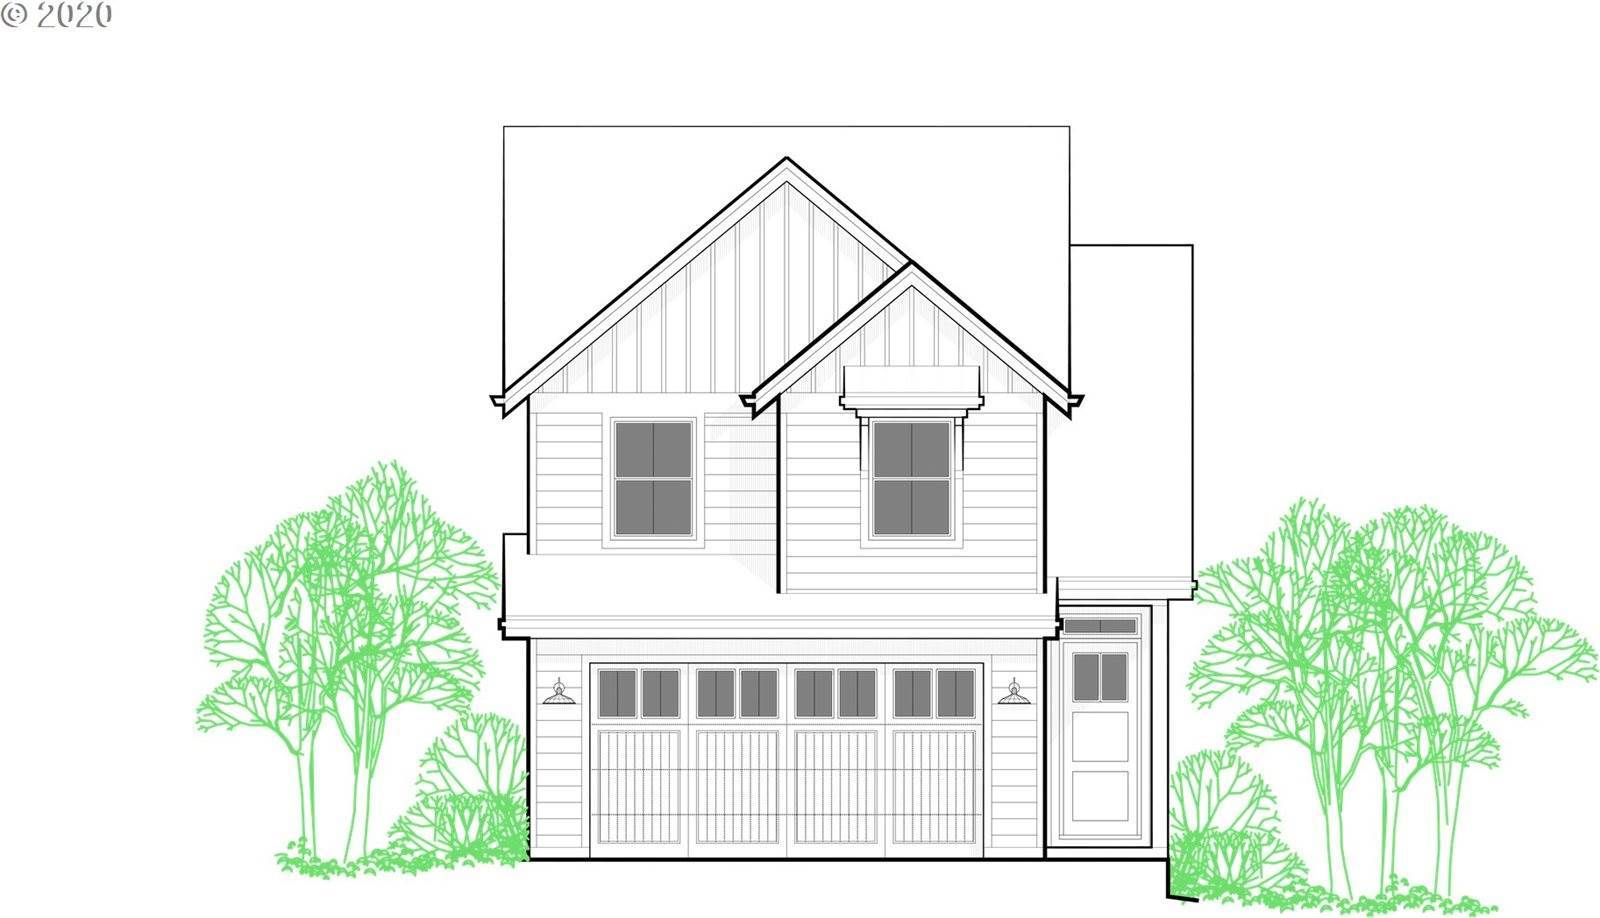 28540 SW Mcgraw Ave, Wilsonville, OR 97070